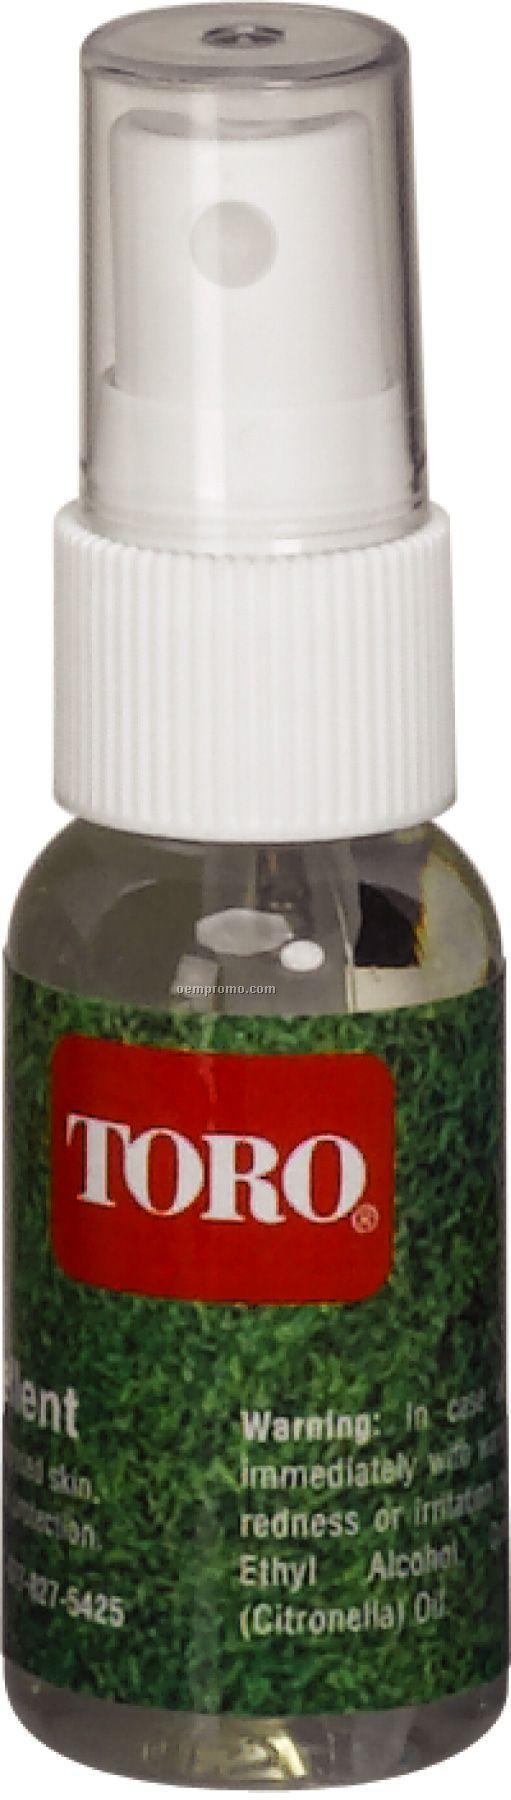 1 Oz. Natural Citronella Bug Spray